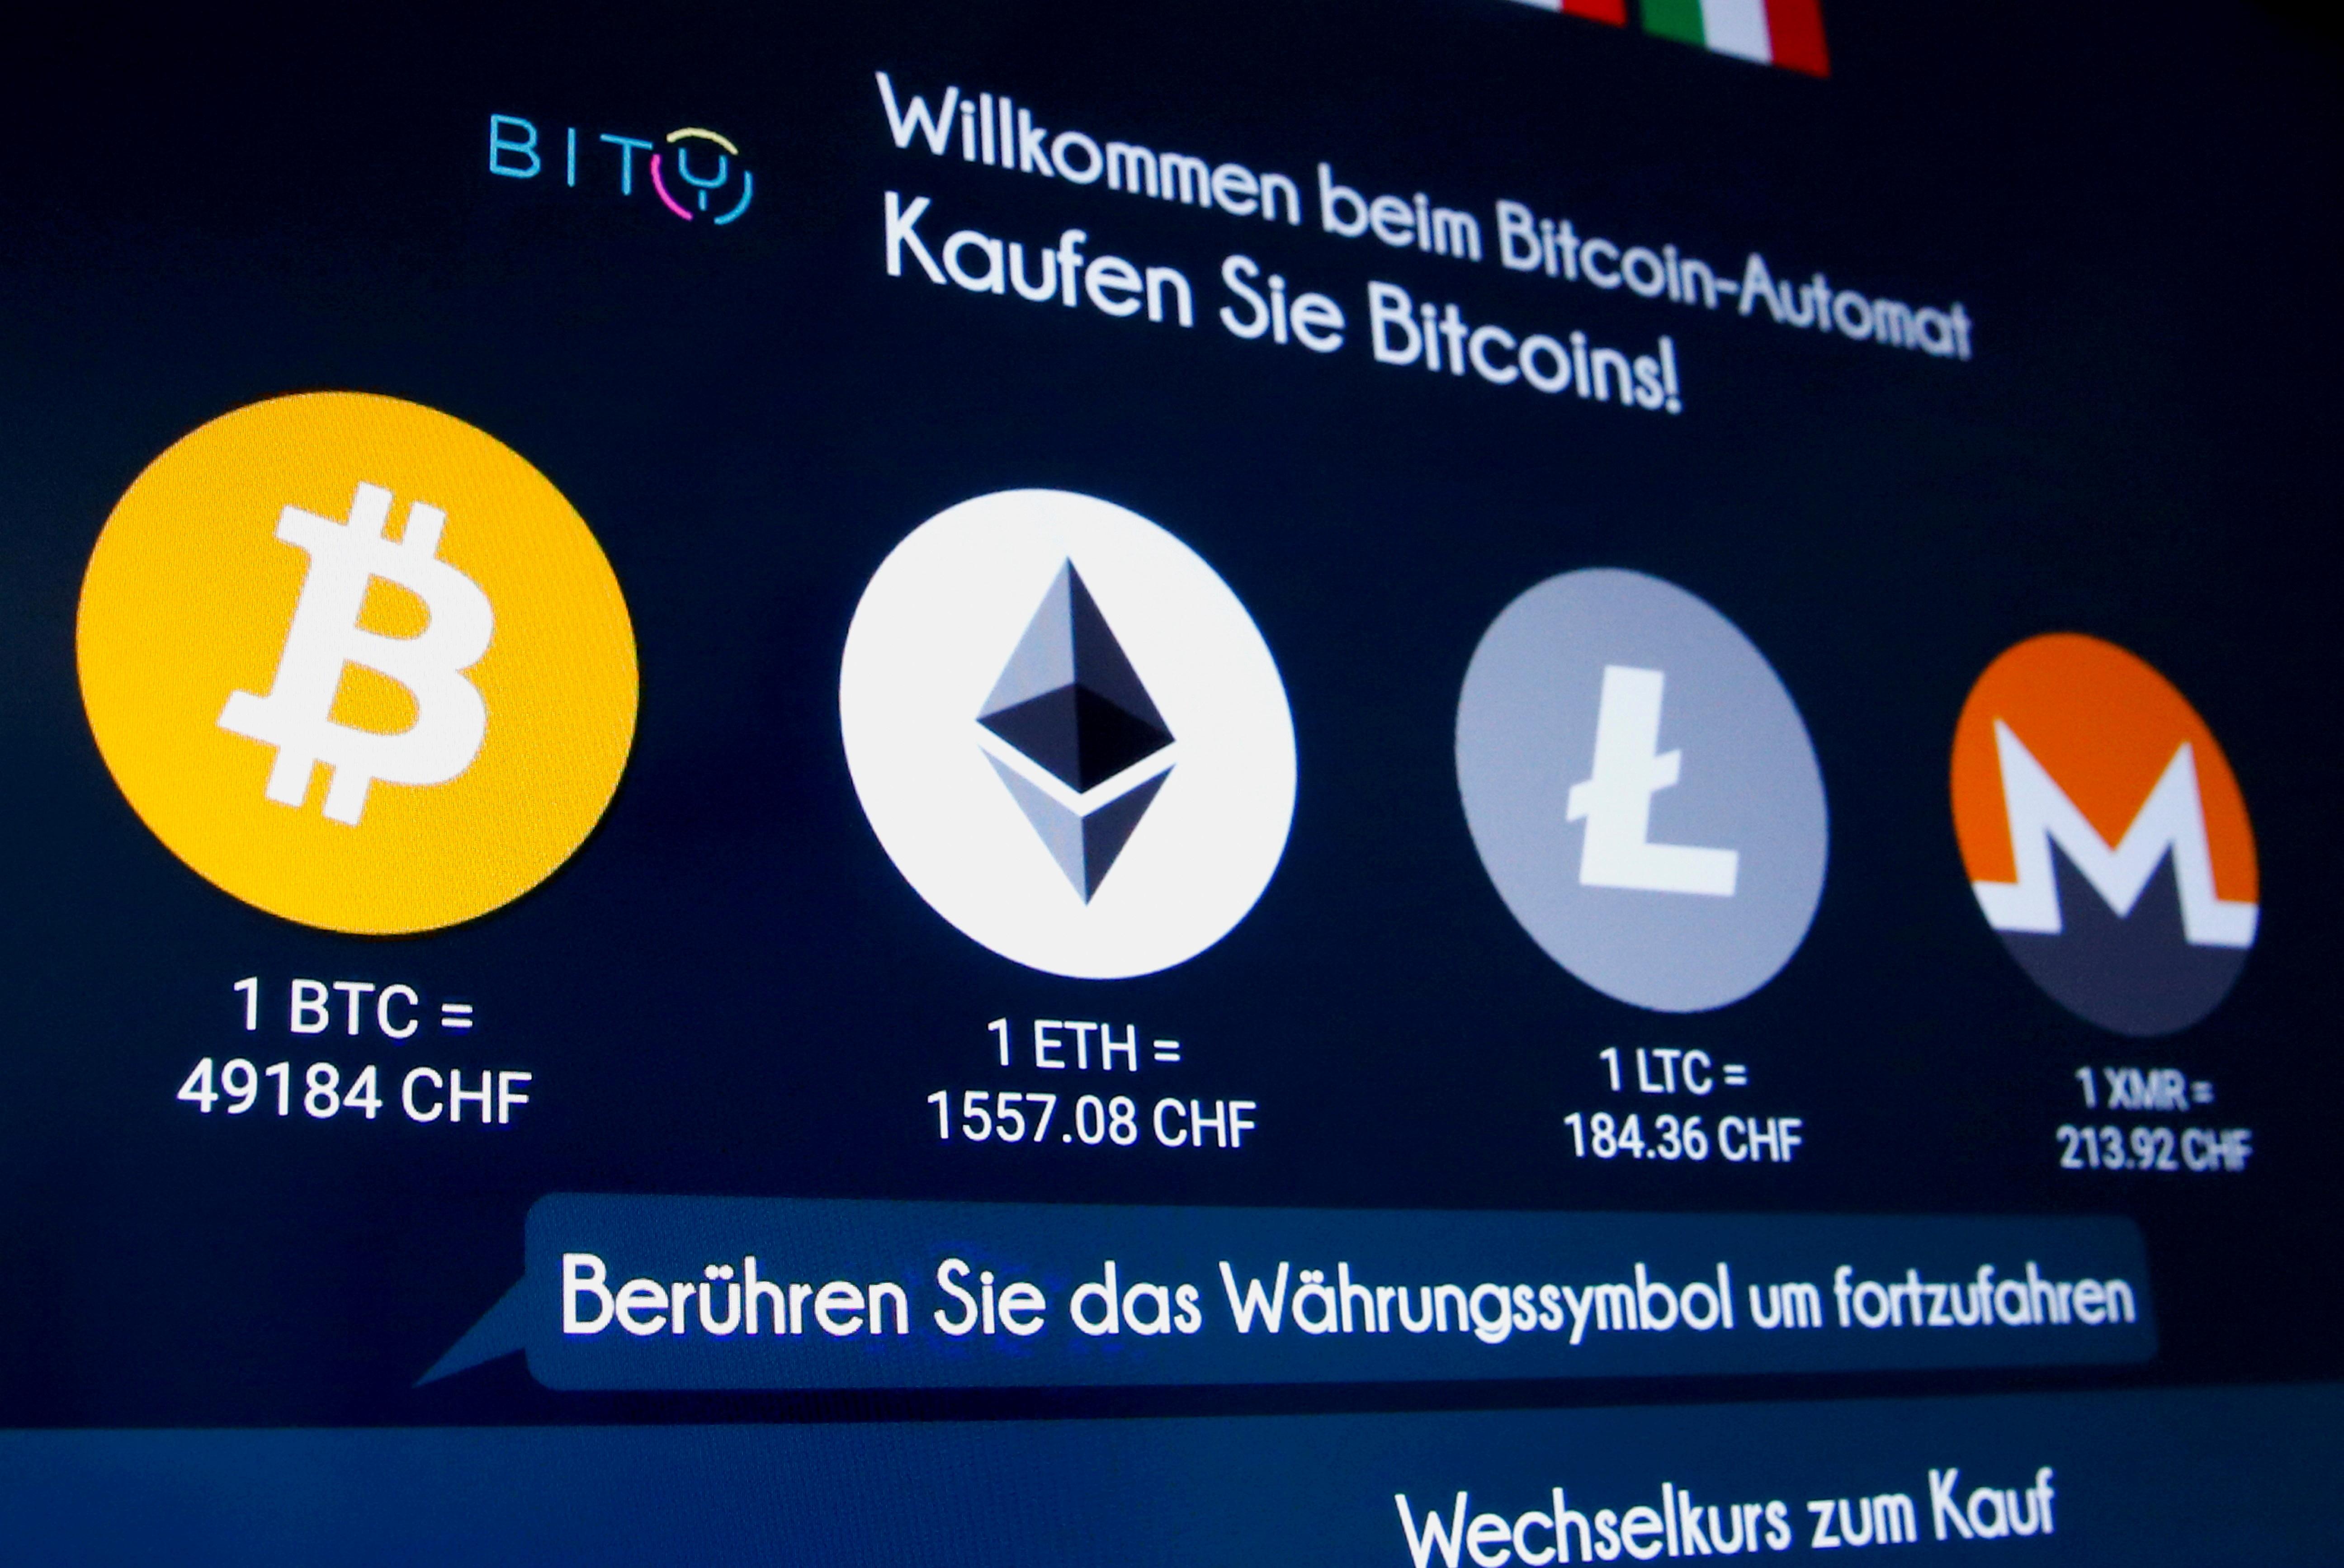 brutus crypto trading bot bitcoin kaufen software